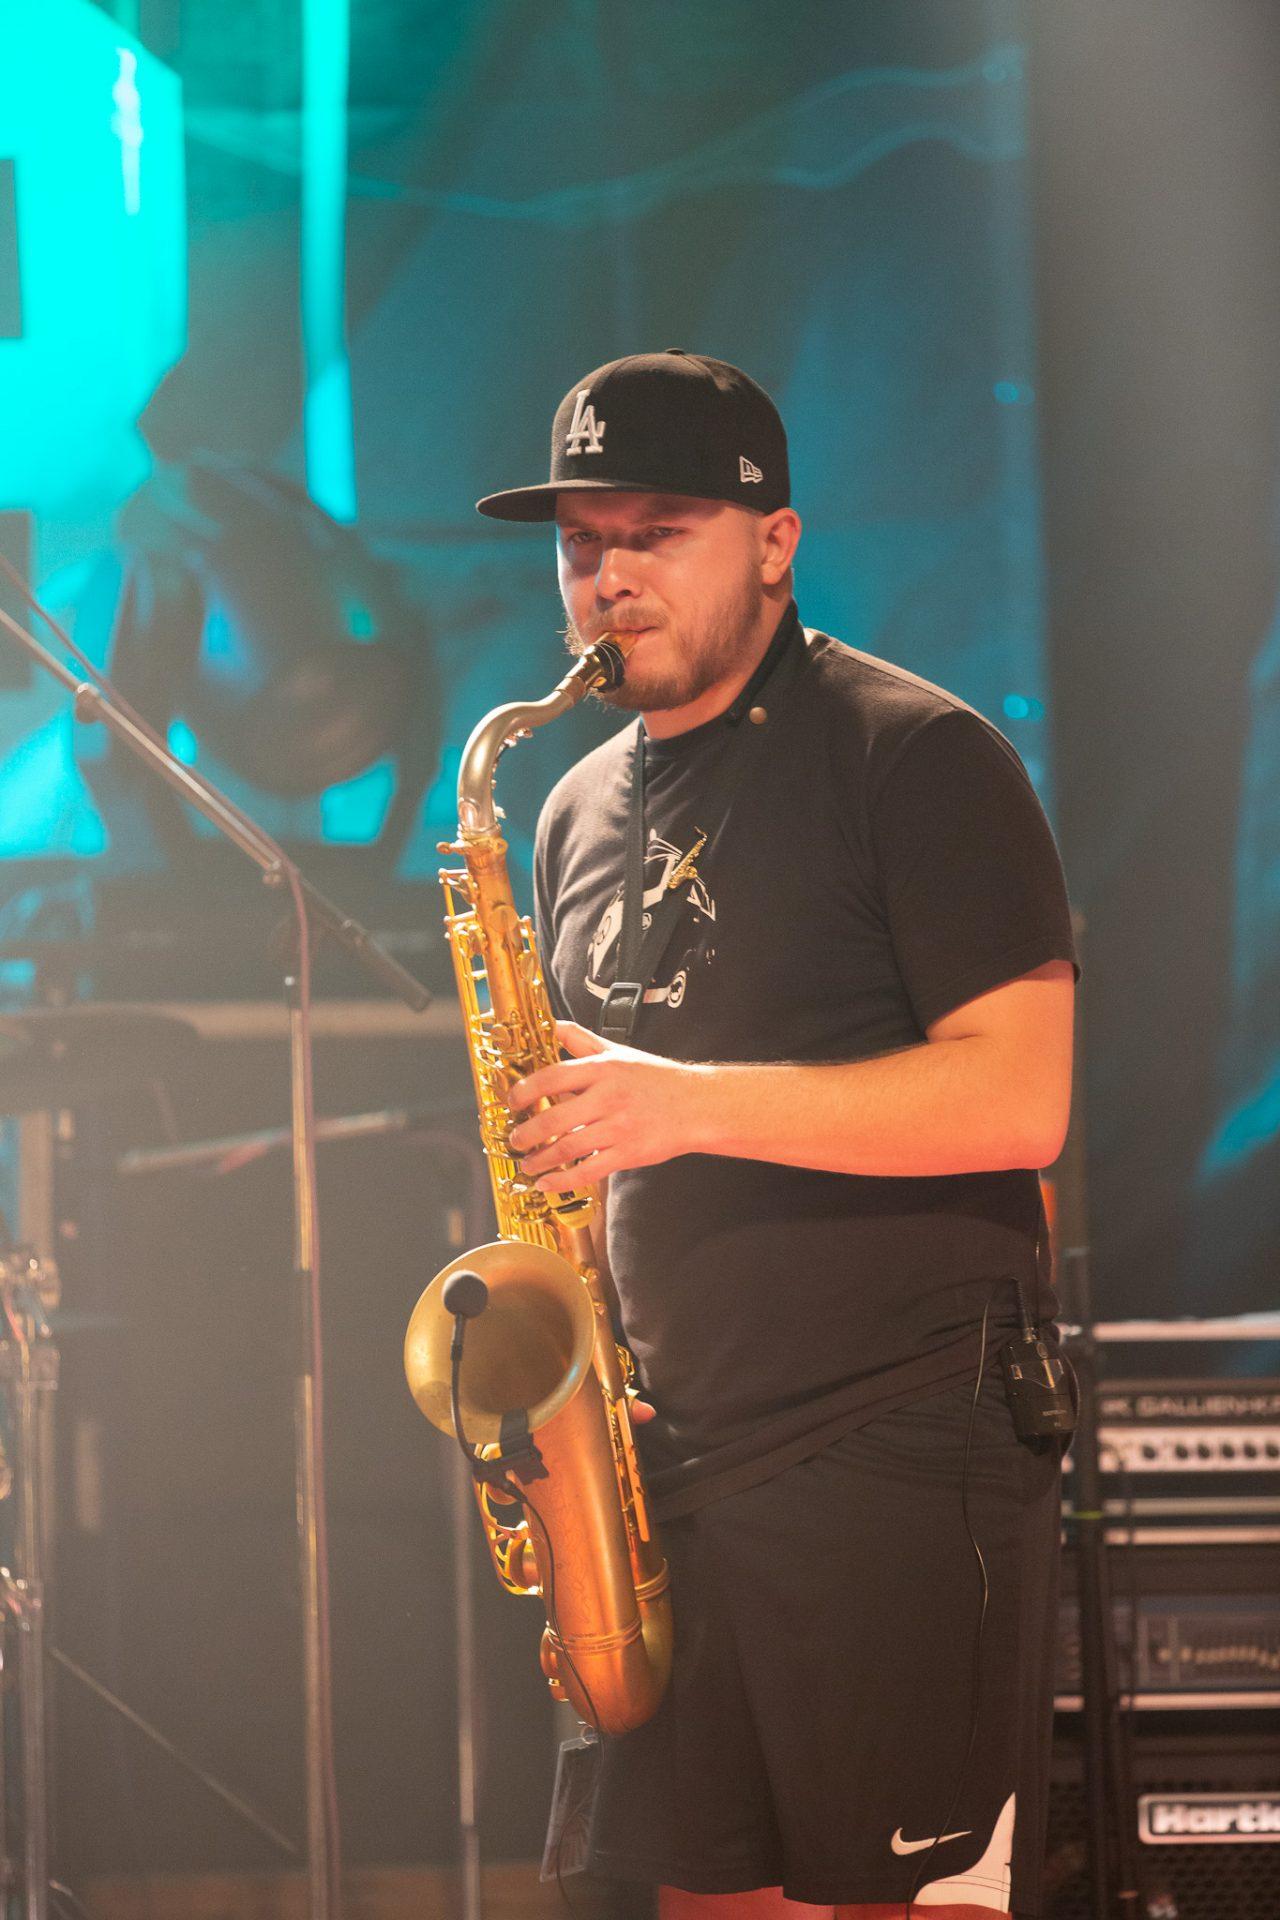 NH3 - Saxophonist